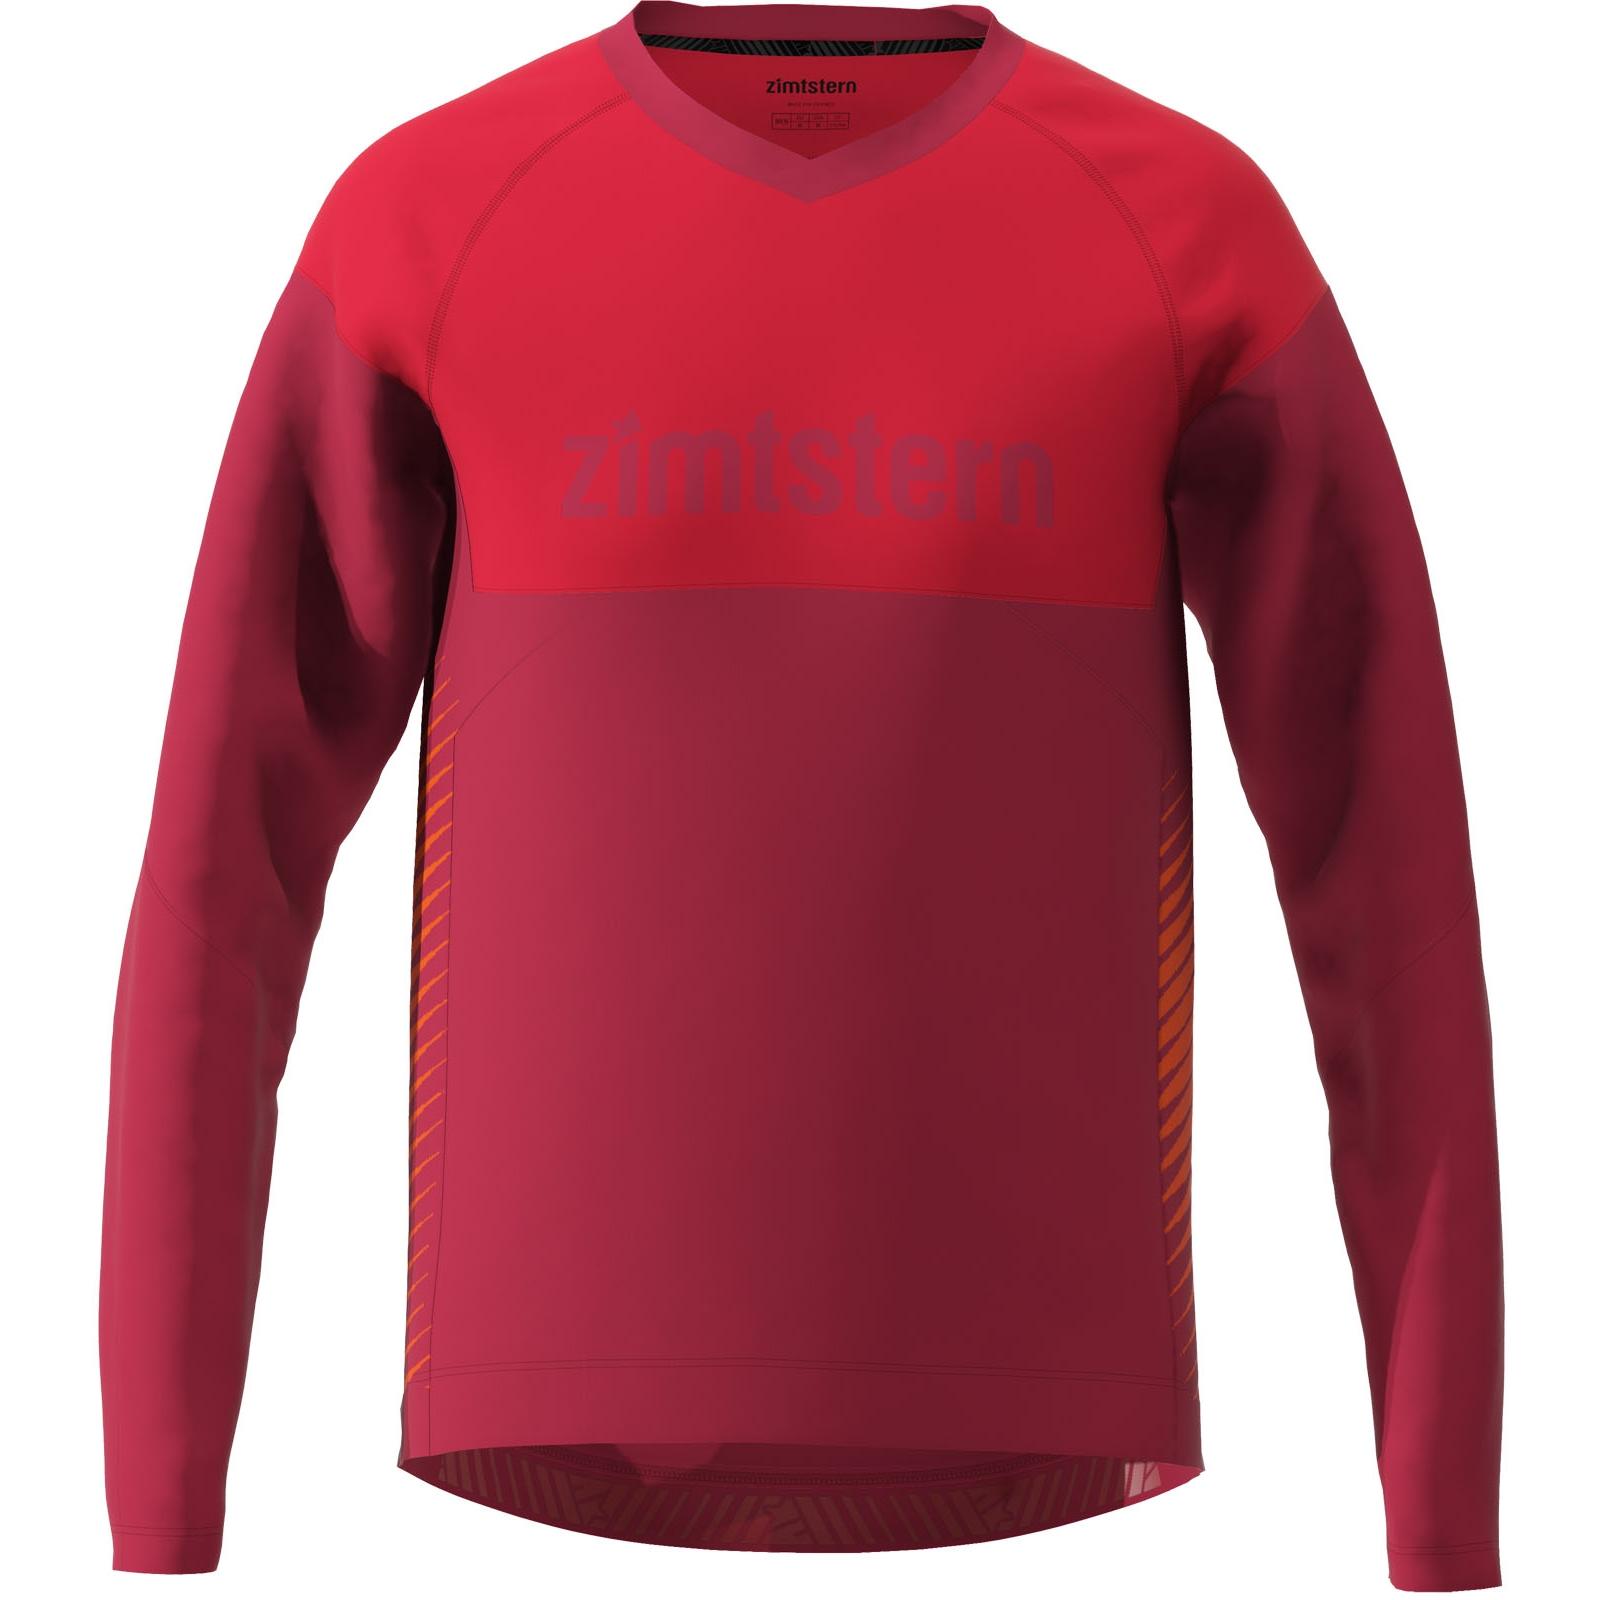 Zimtstern Bulletz Langarm-Shirt - jester red/cyber red/tomato